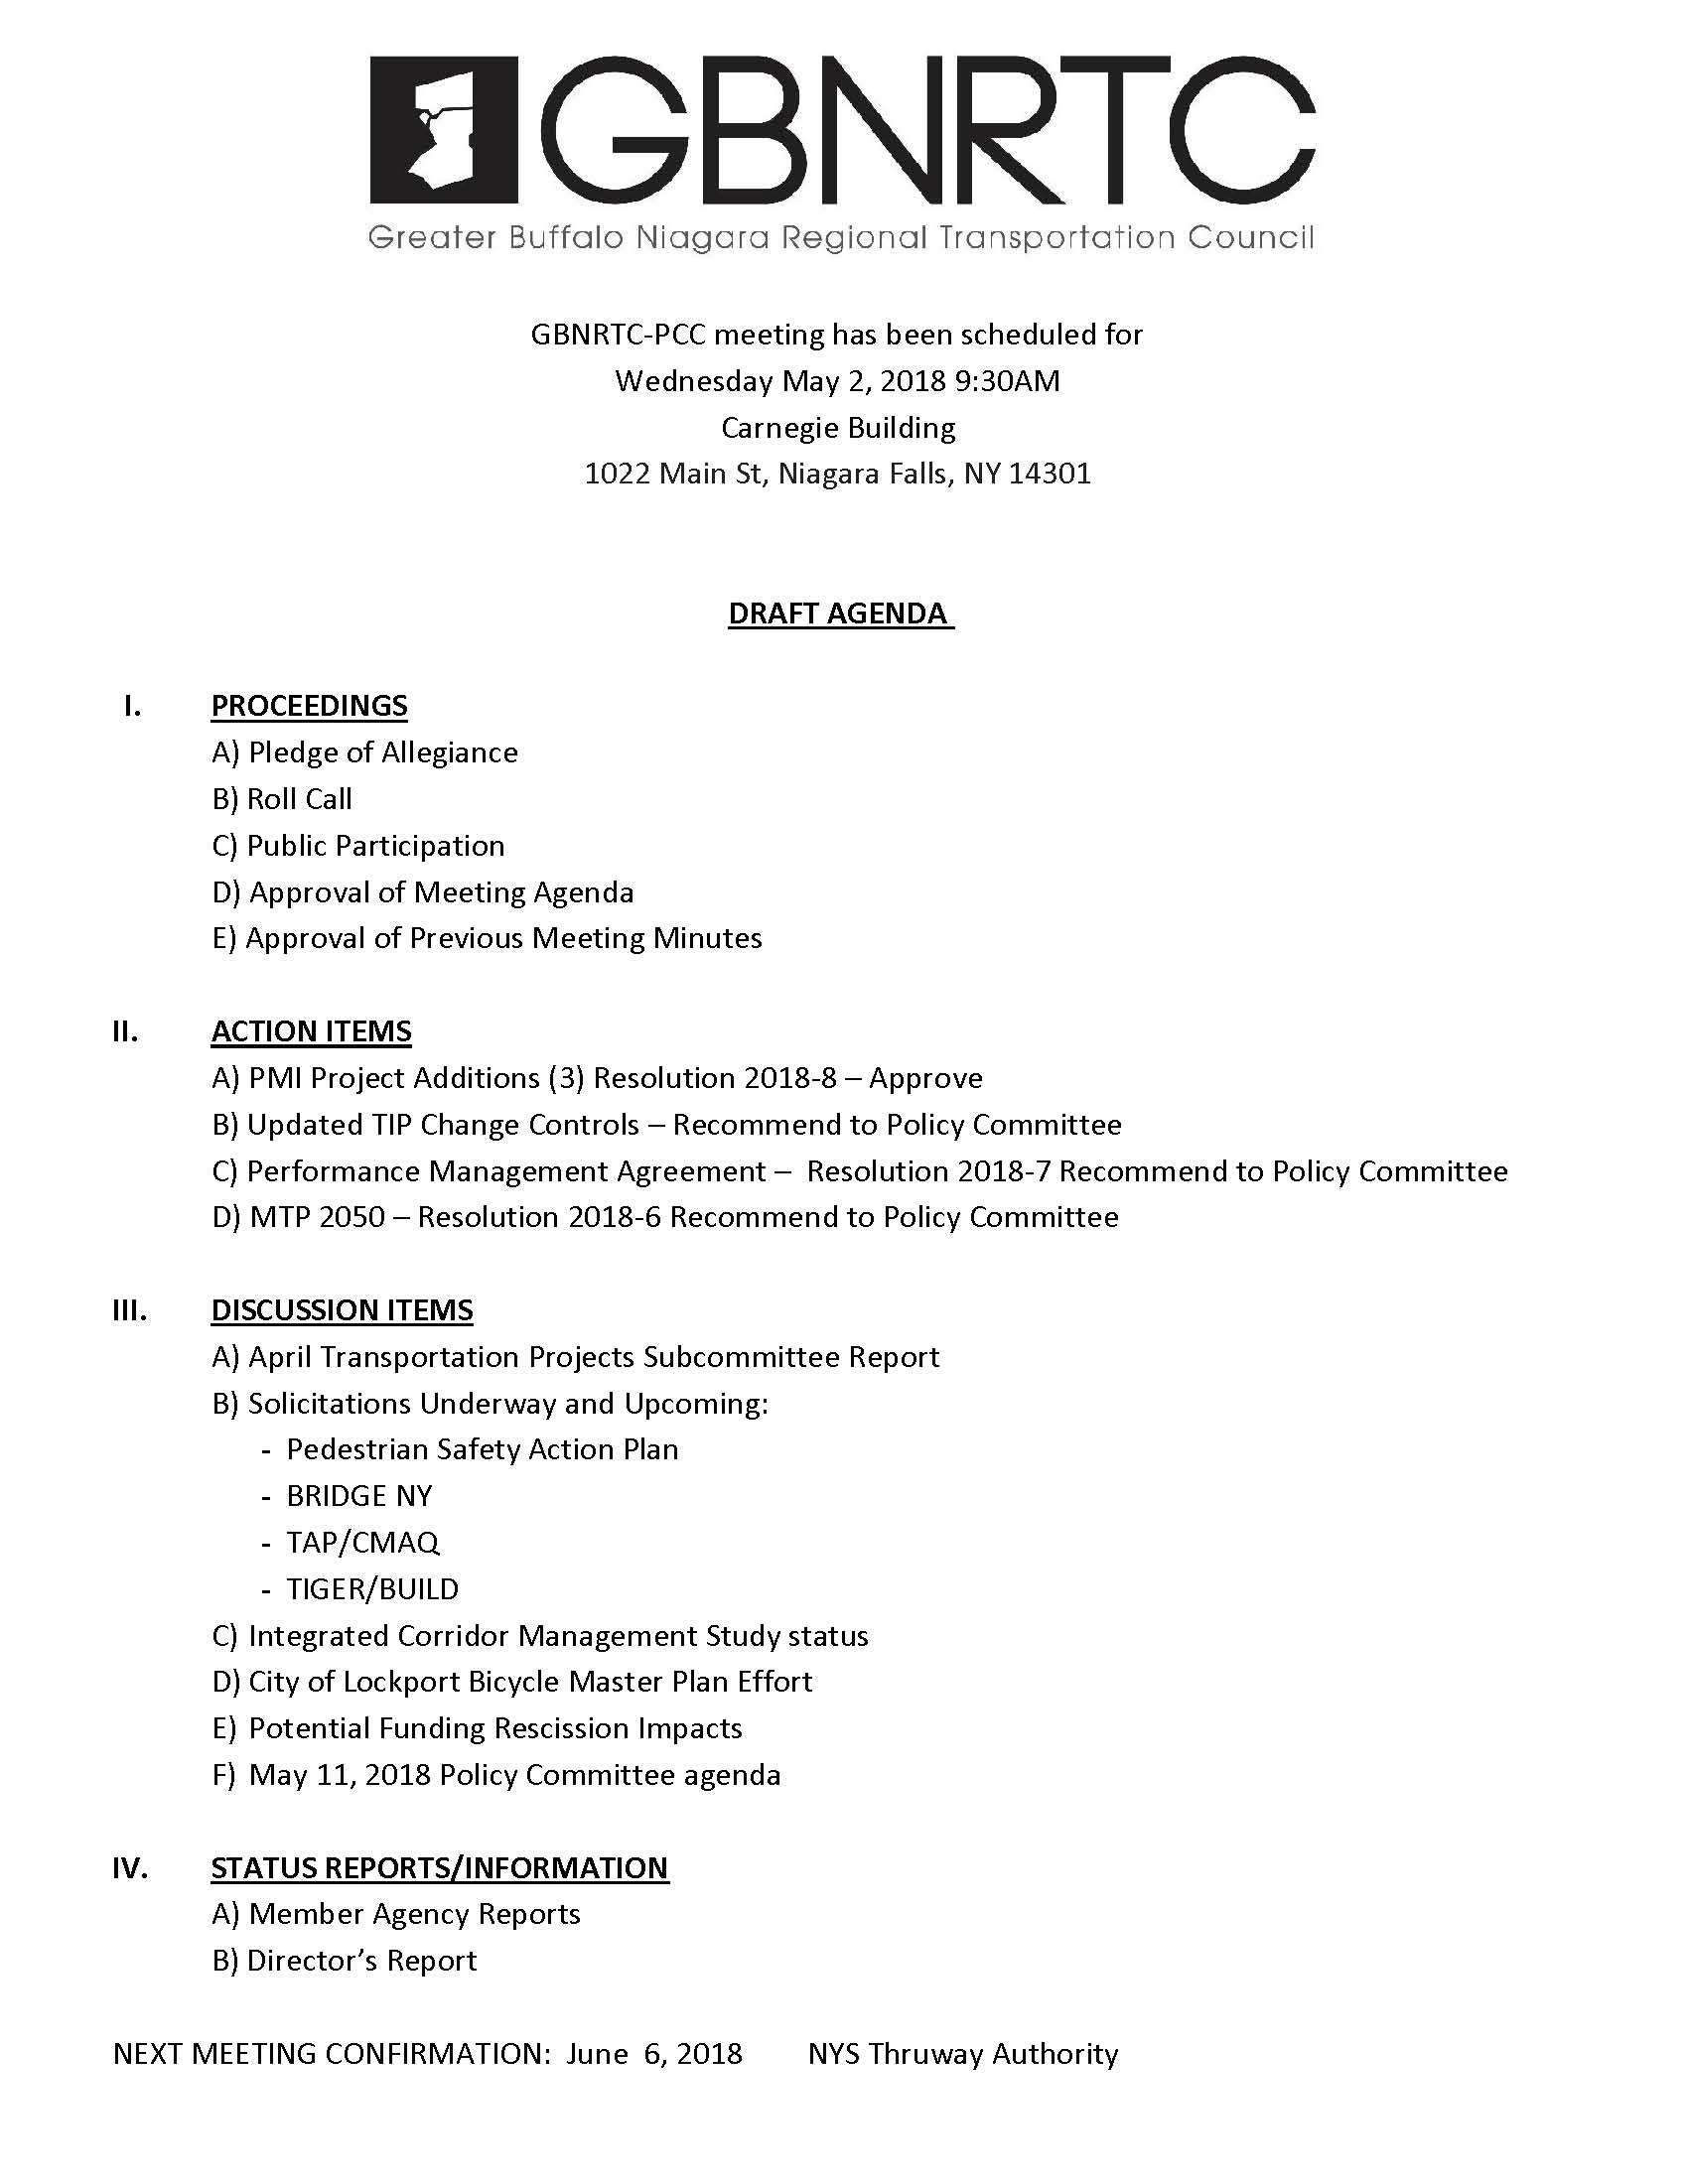 PCC Agenda-5-2-2018.jpg